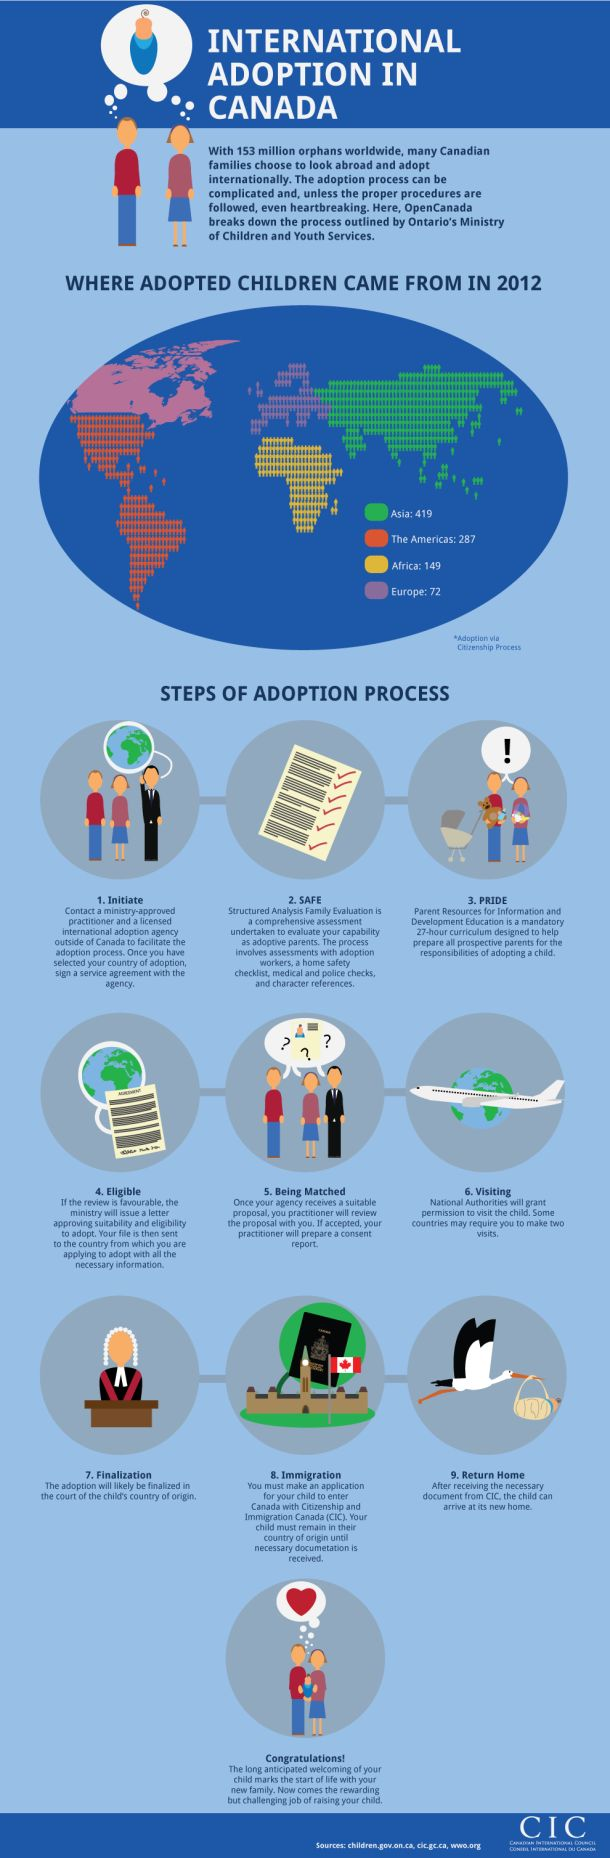 International Adoption In Canada[INFOGRAPHIC]